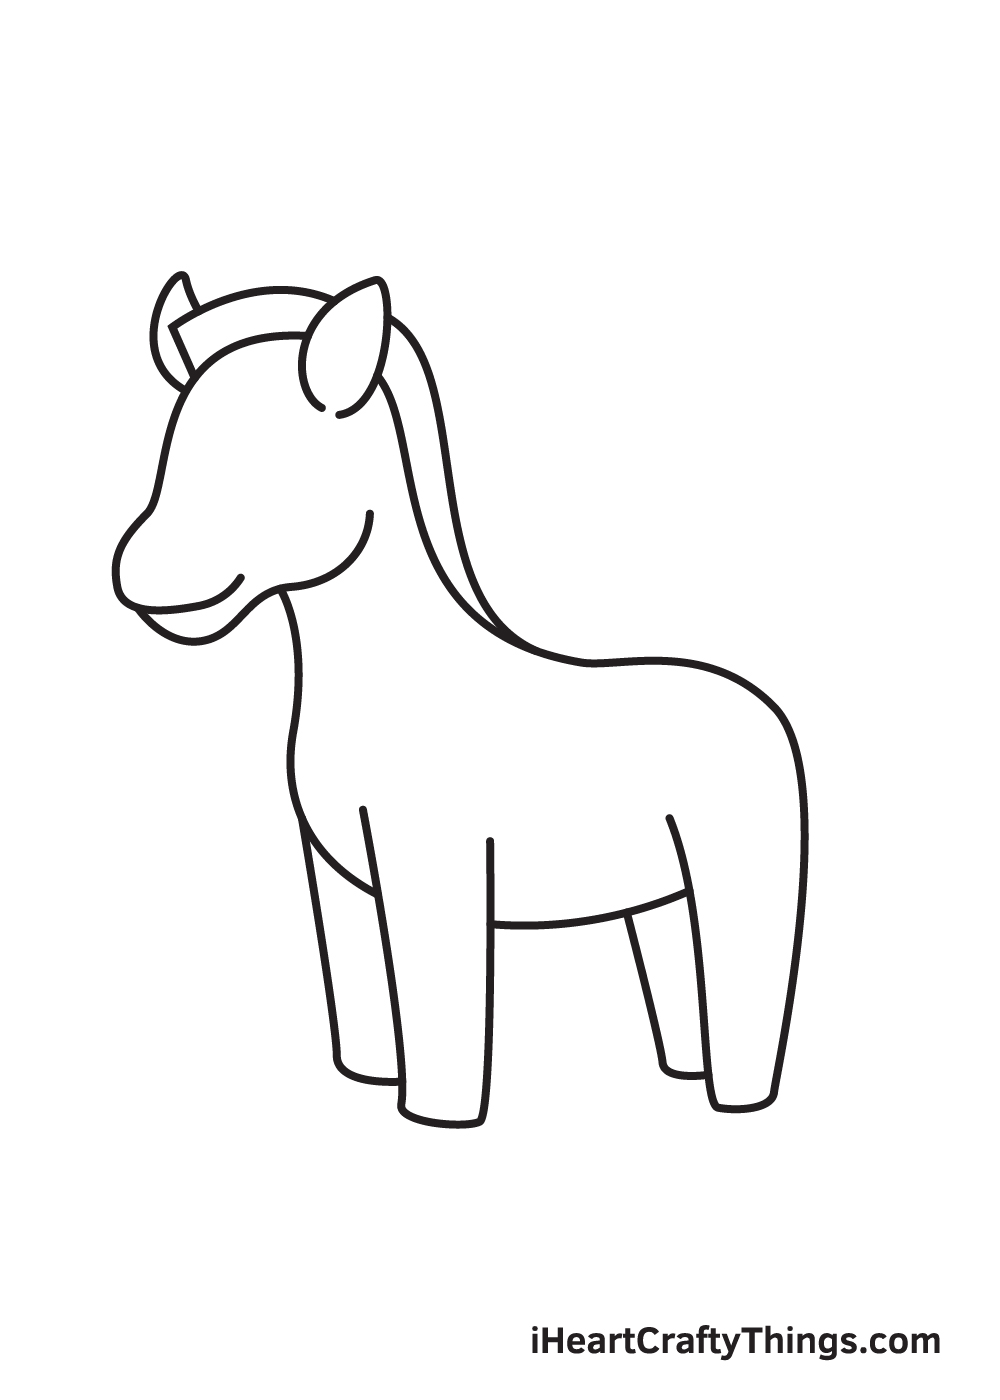 zebra drawing step 6